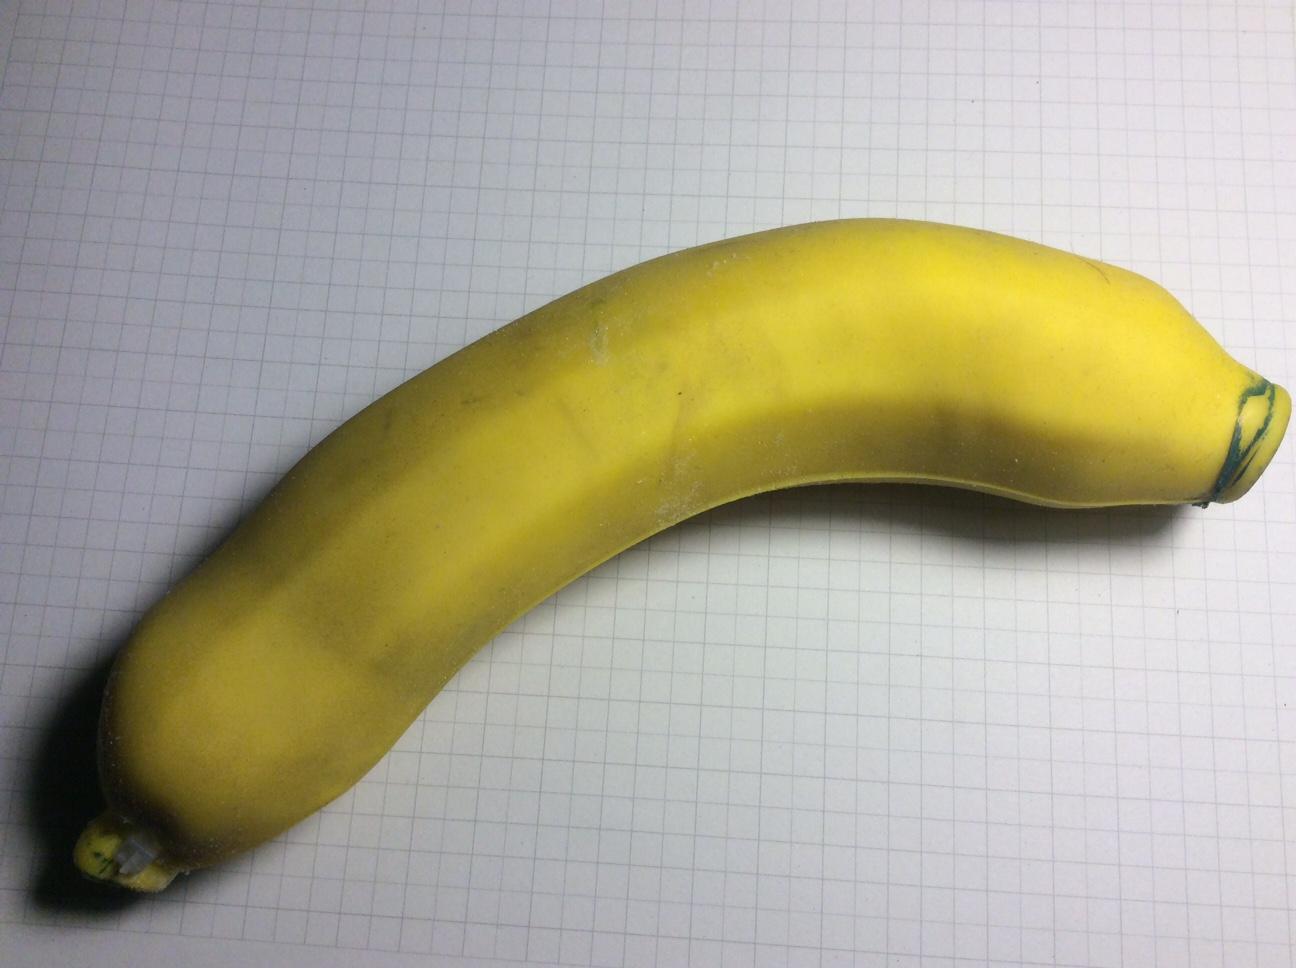 alles banane eine vergleichende studie omega seamaster banana uhrforum. Black Bedroom Furniture Sets. Home Design Ideas